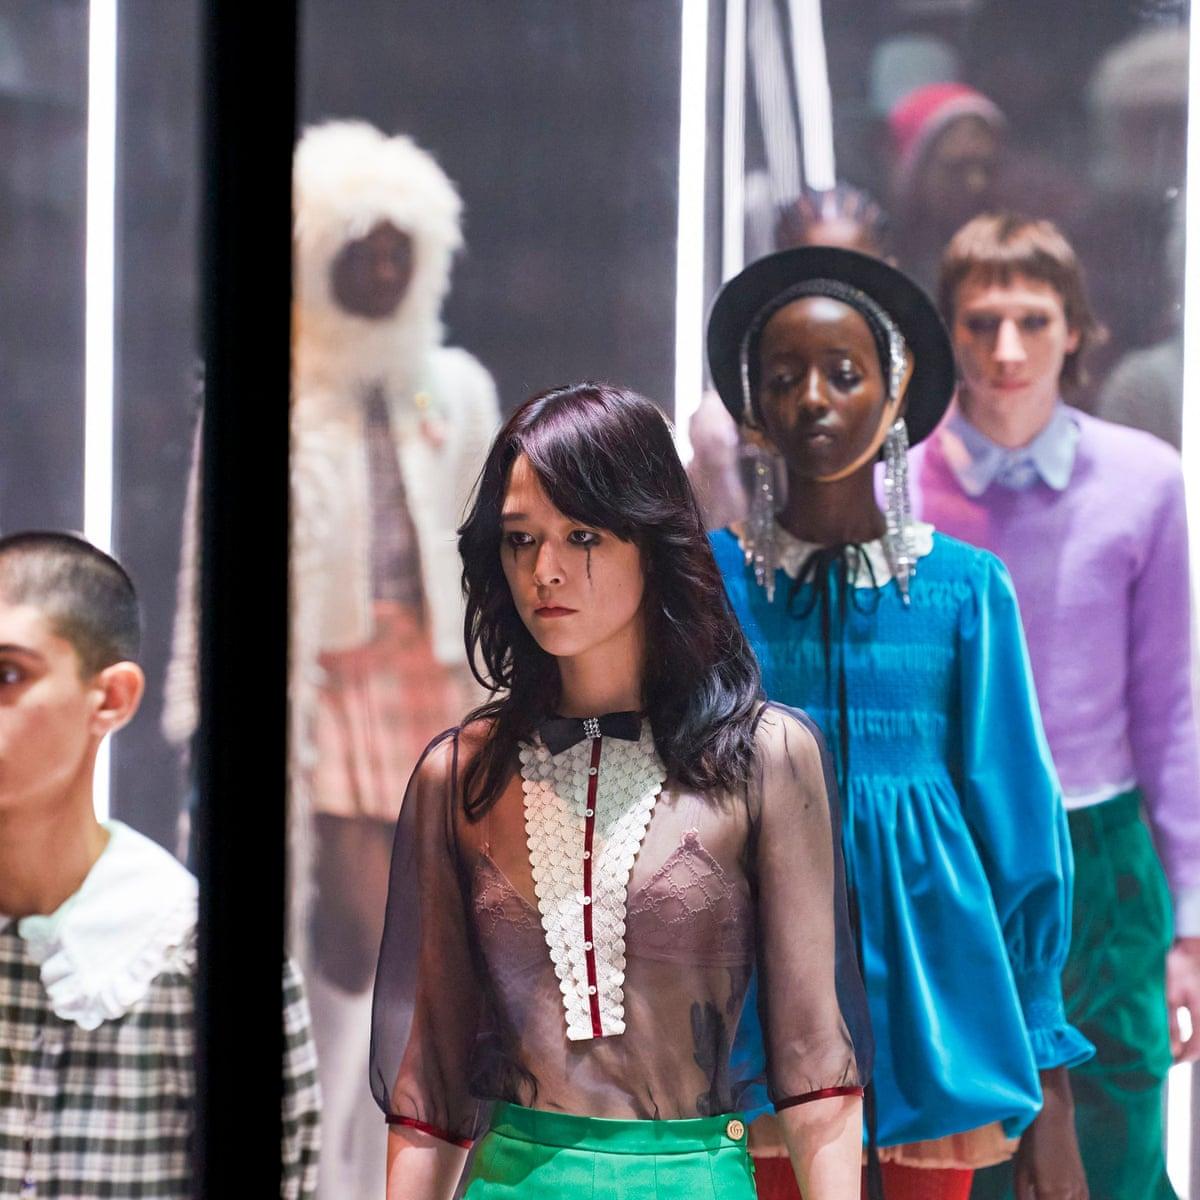 Gucci Bids Farewell To Fashion Week As Brand Goes Seasonless Fashion The Guardian